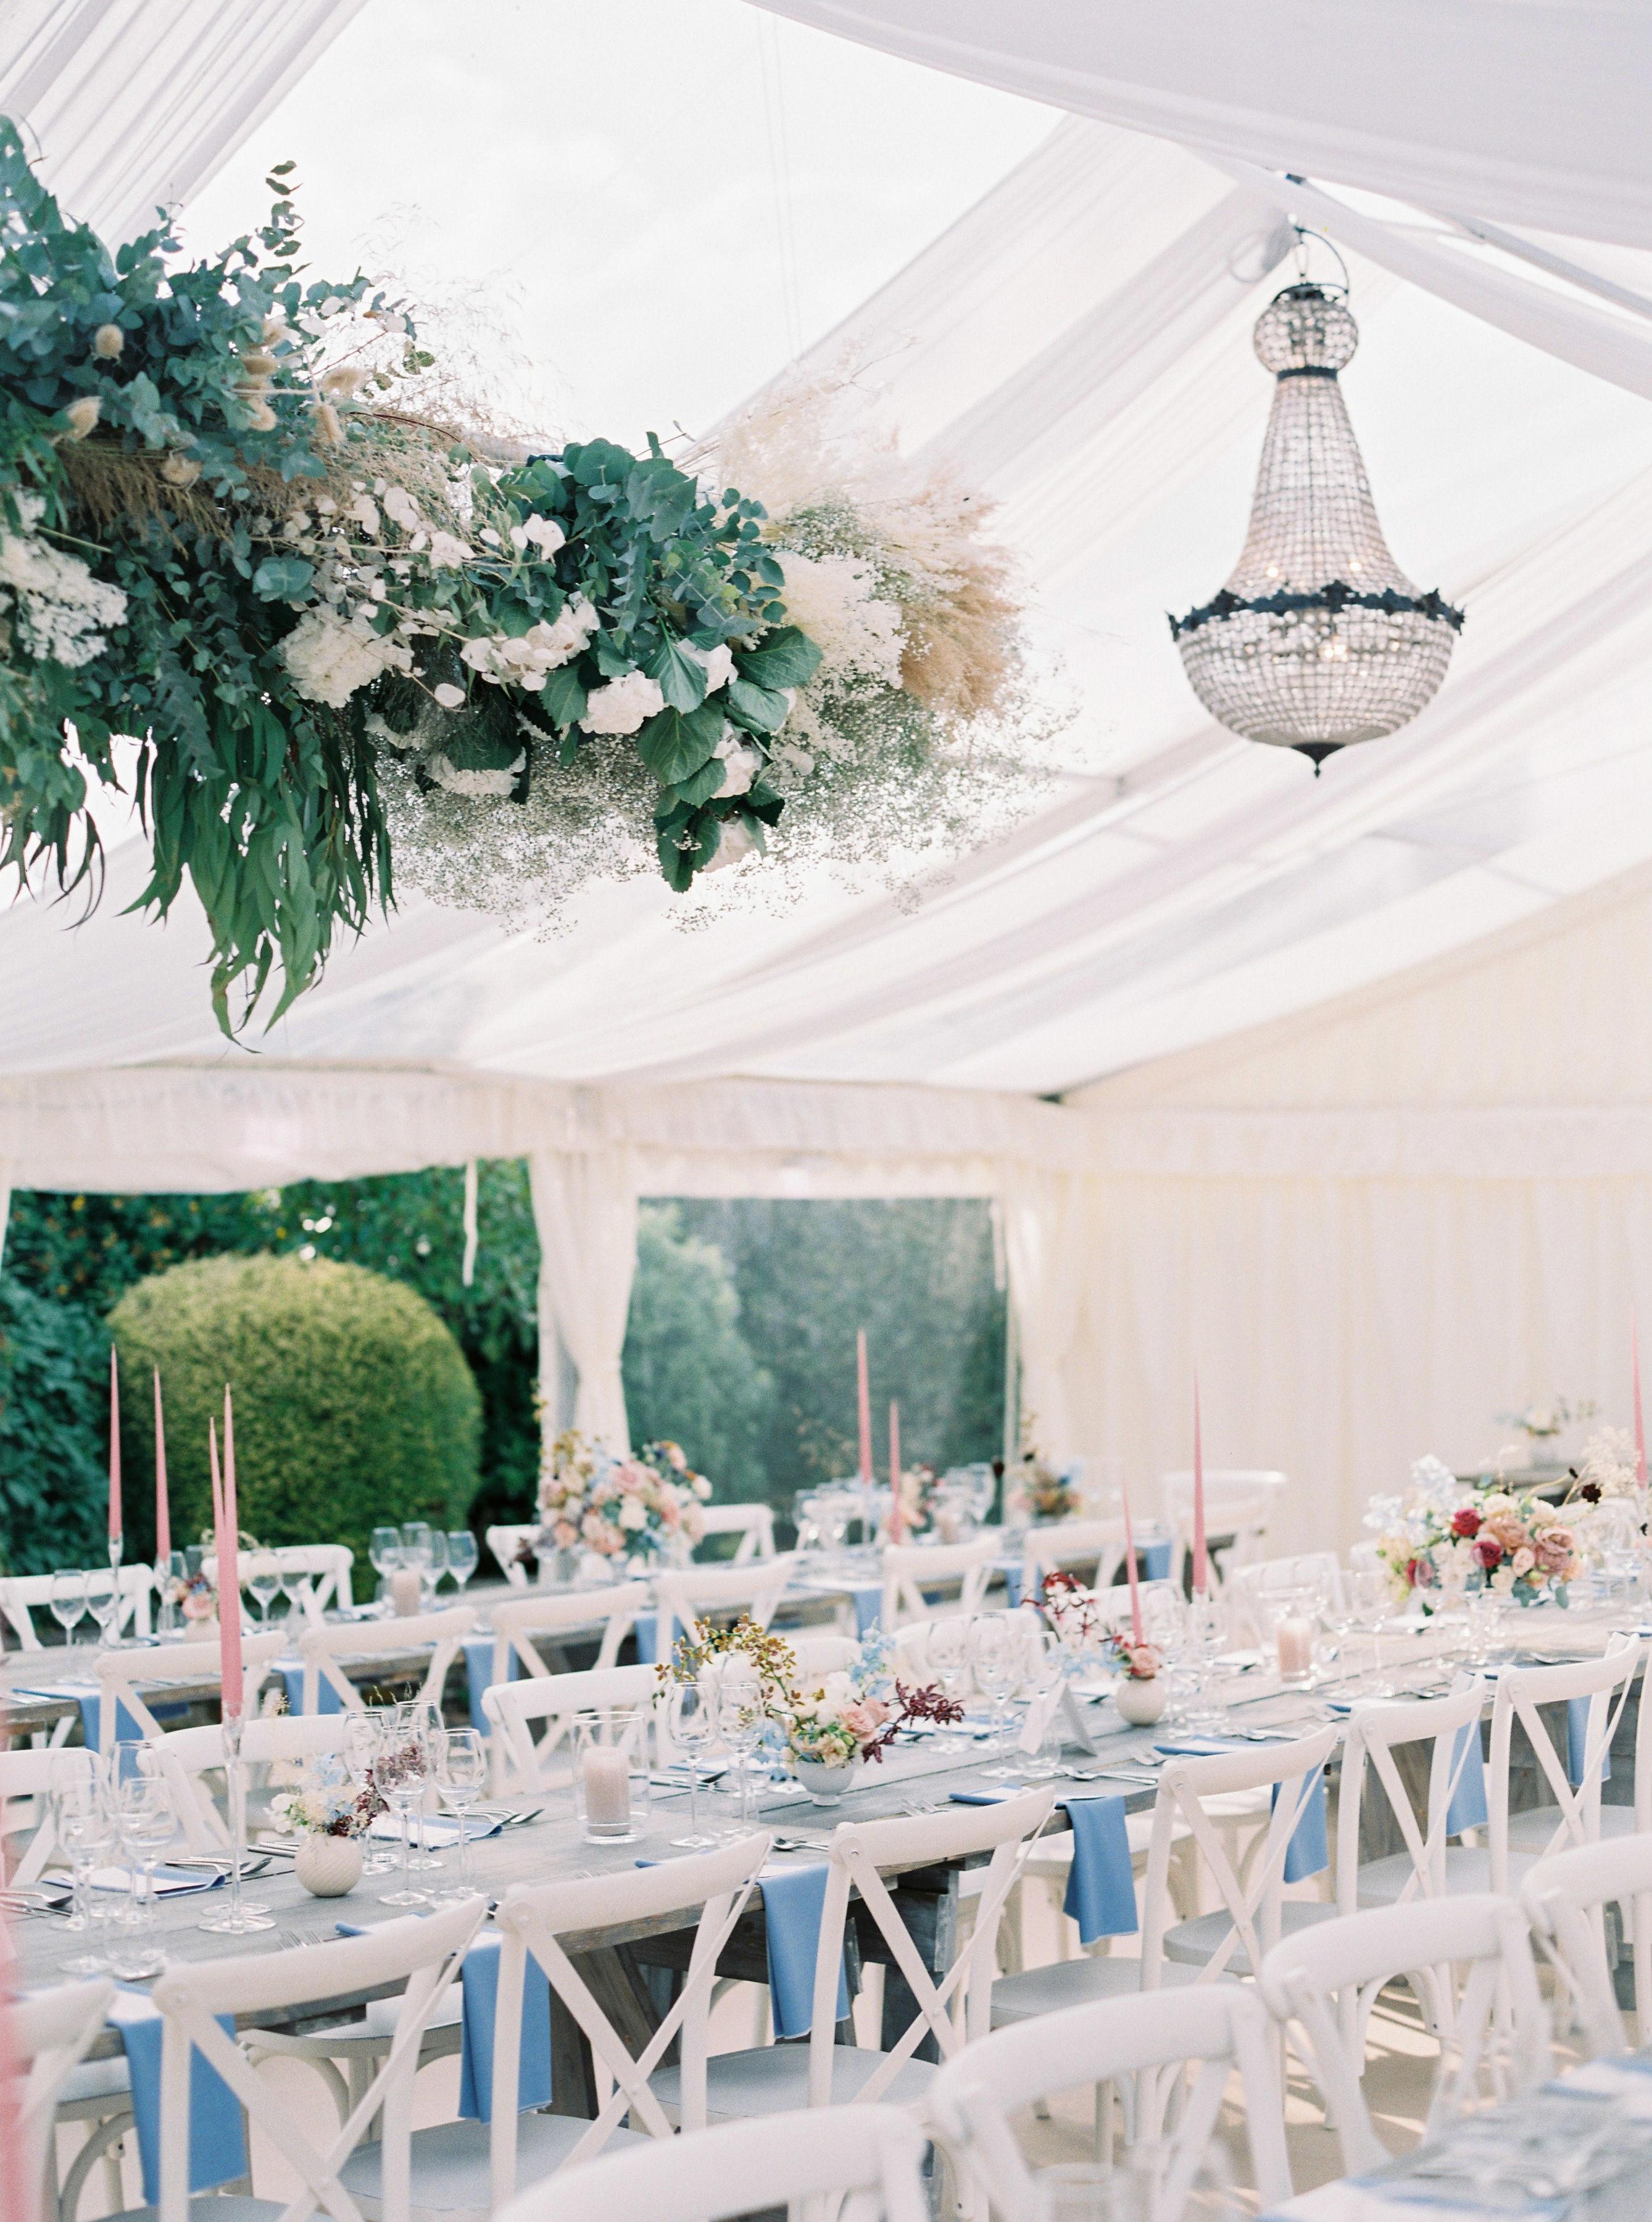 wedding reception stuart moorat - 640×640